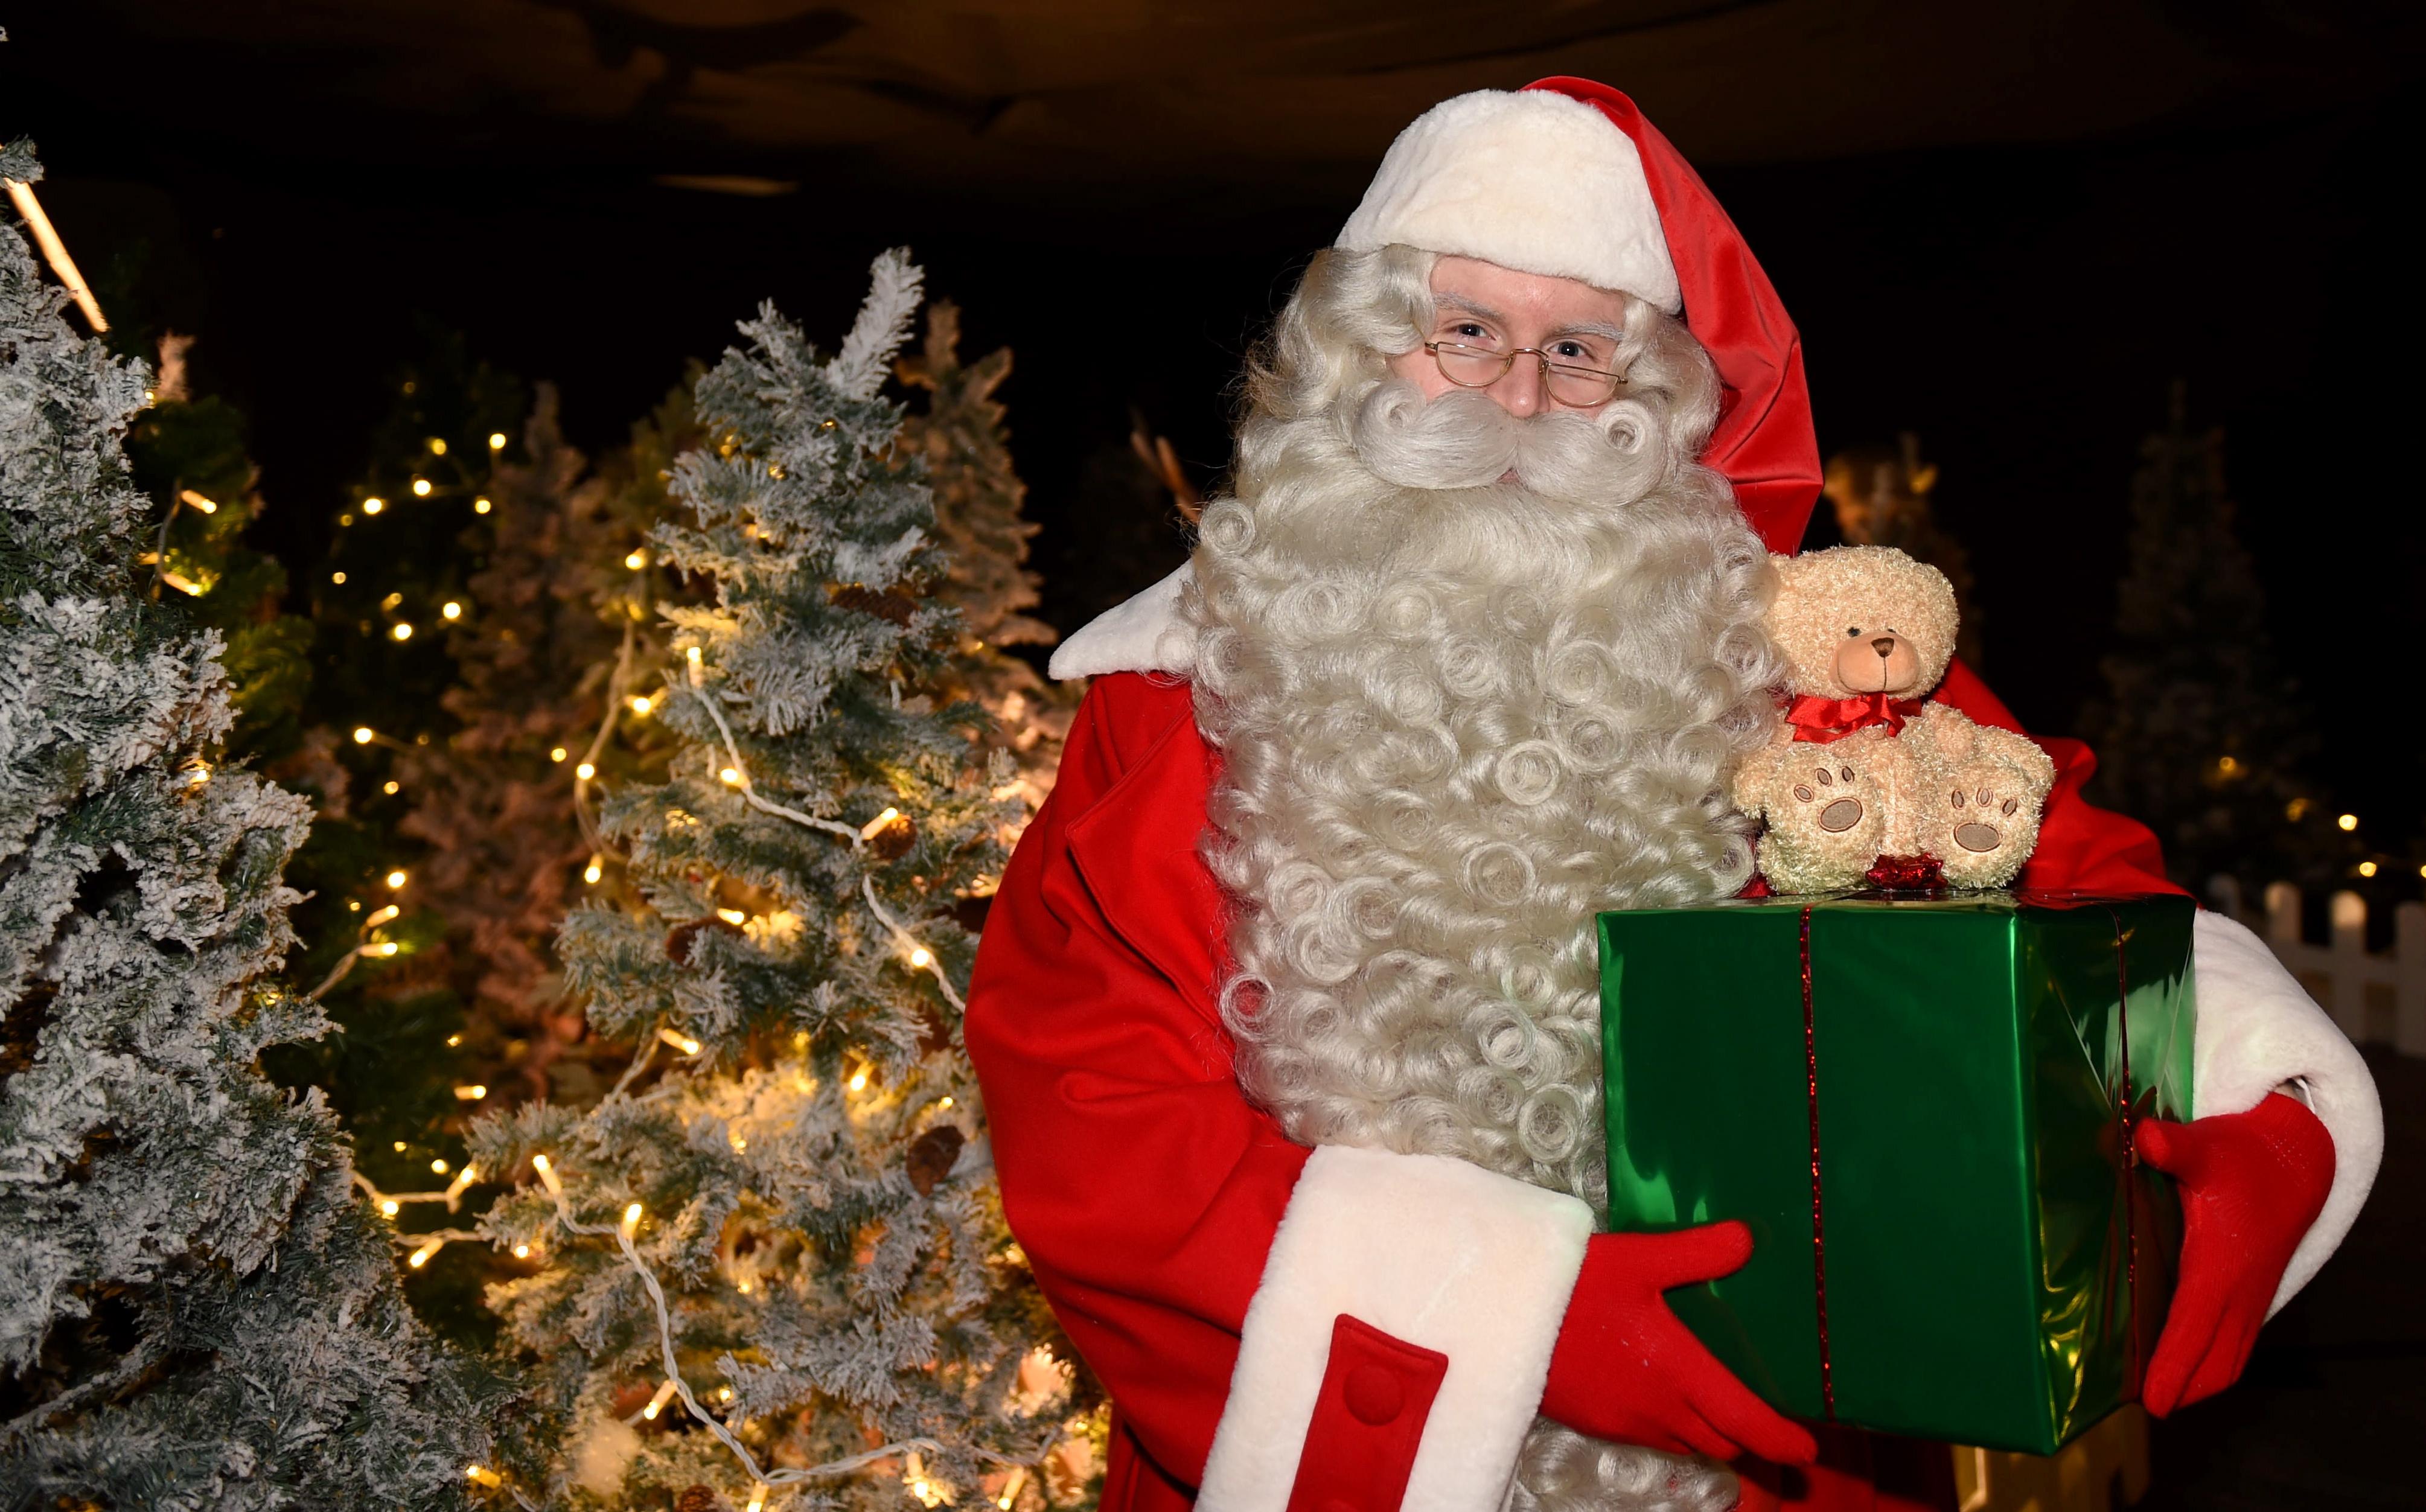 Santa was seen setting up at the grotto